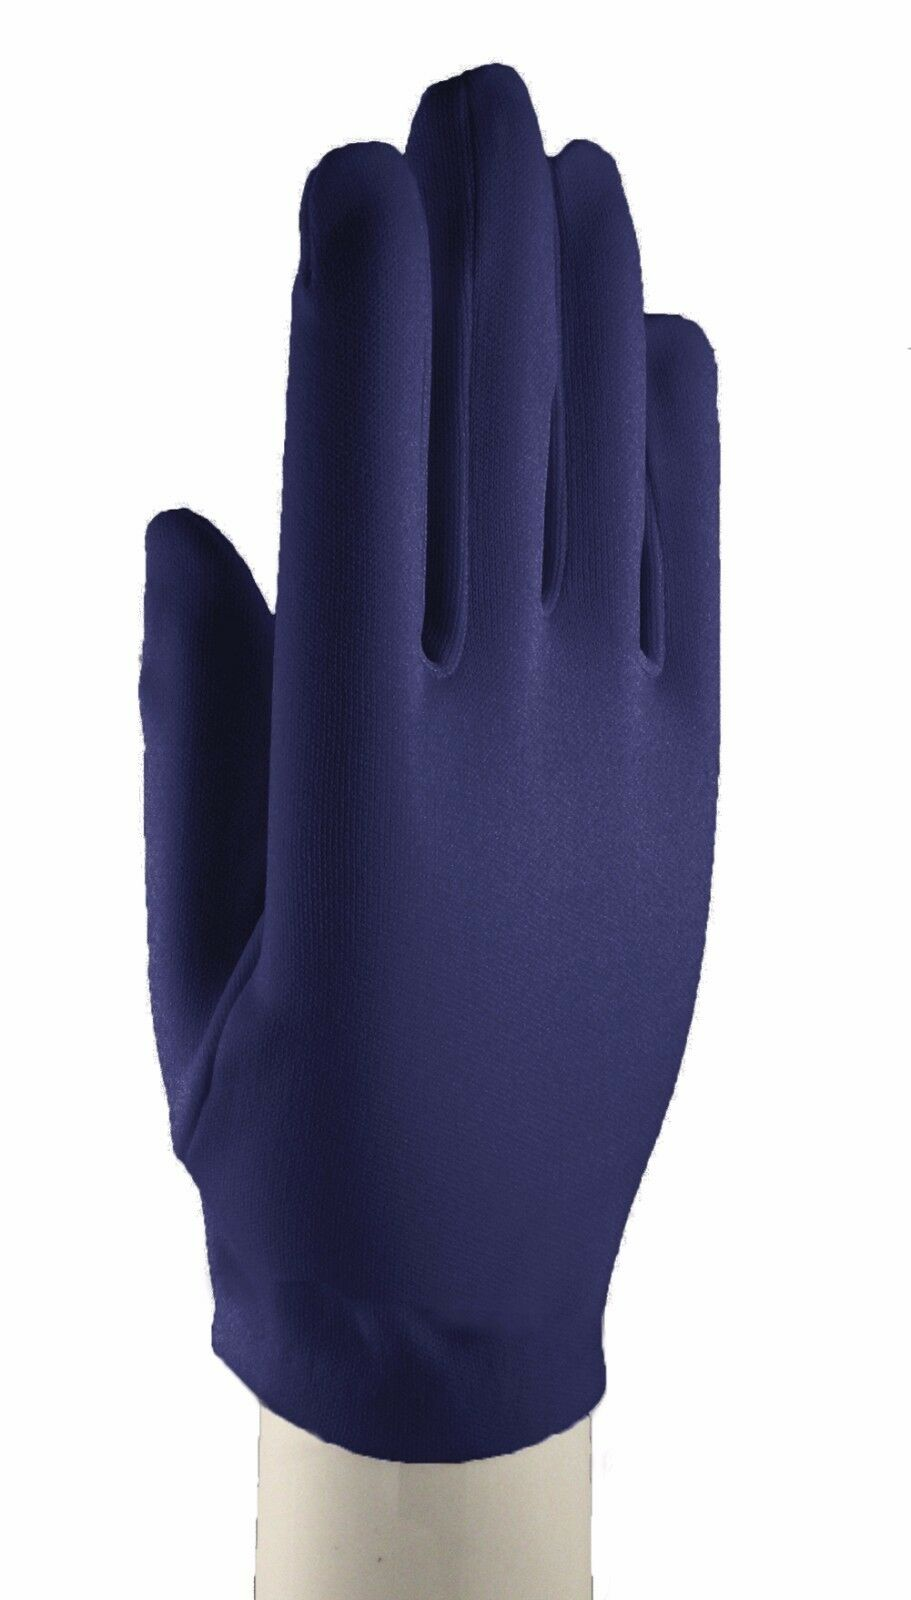 Black dress up gloves - Wrist Length Dress Gloves Dress Up Church Formal